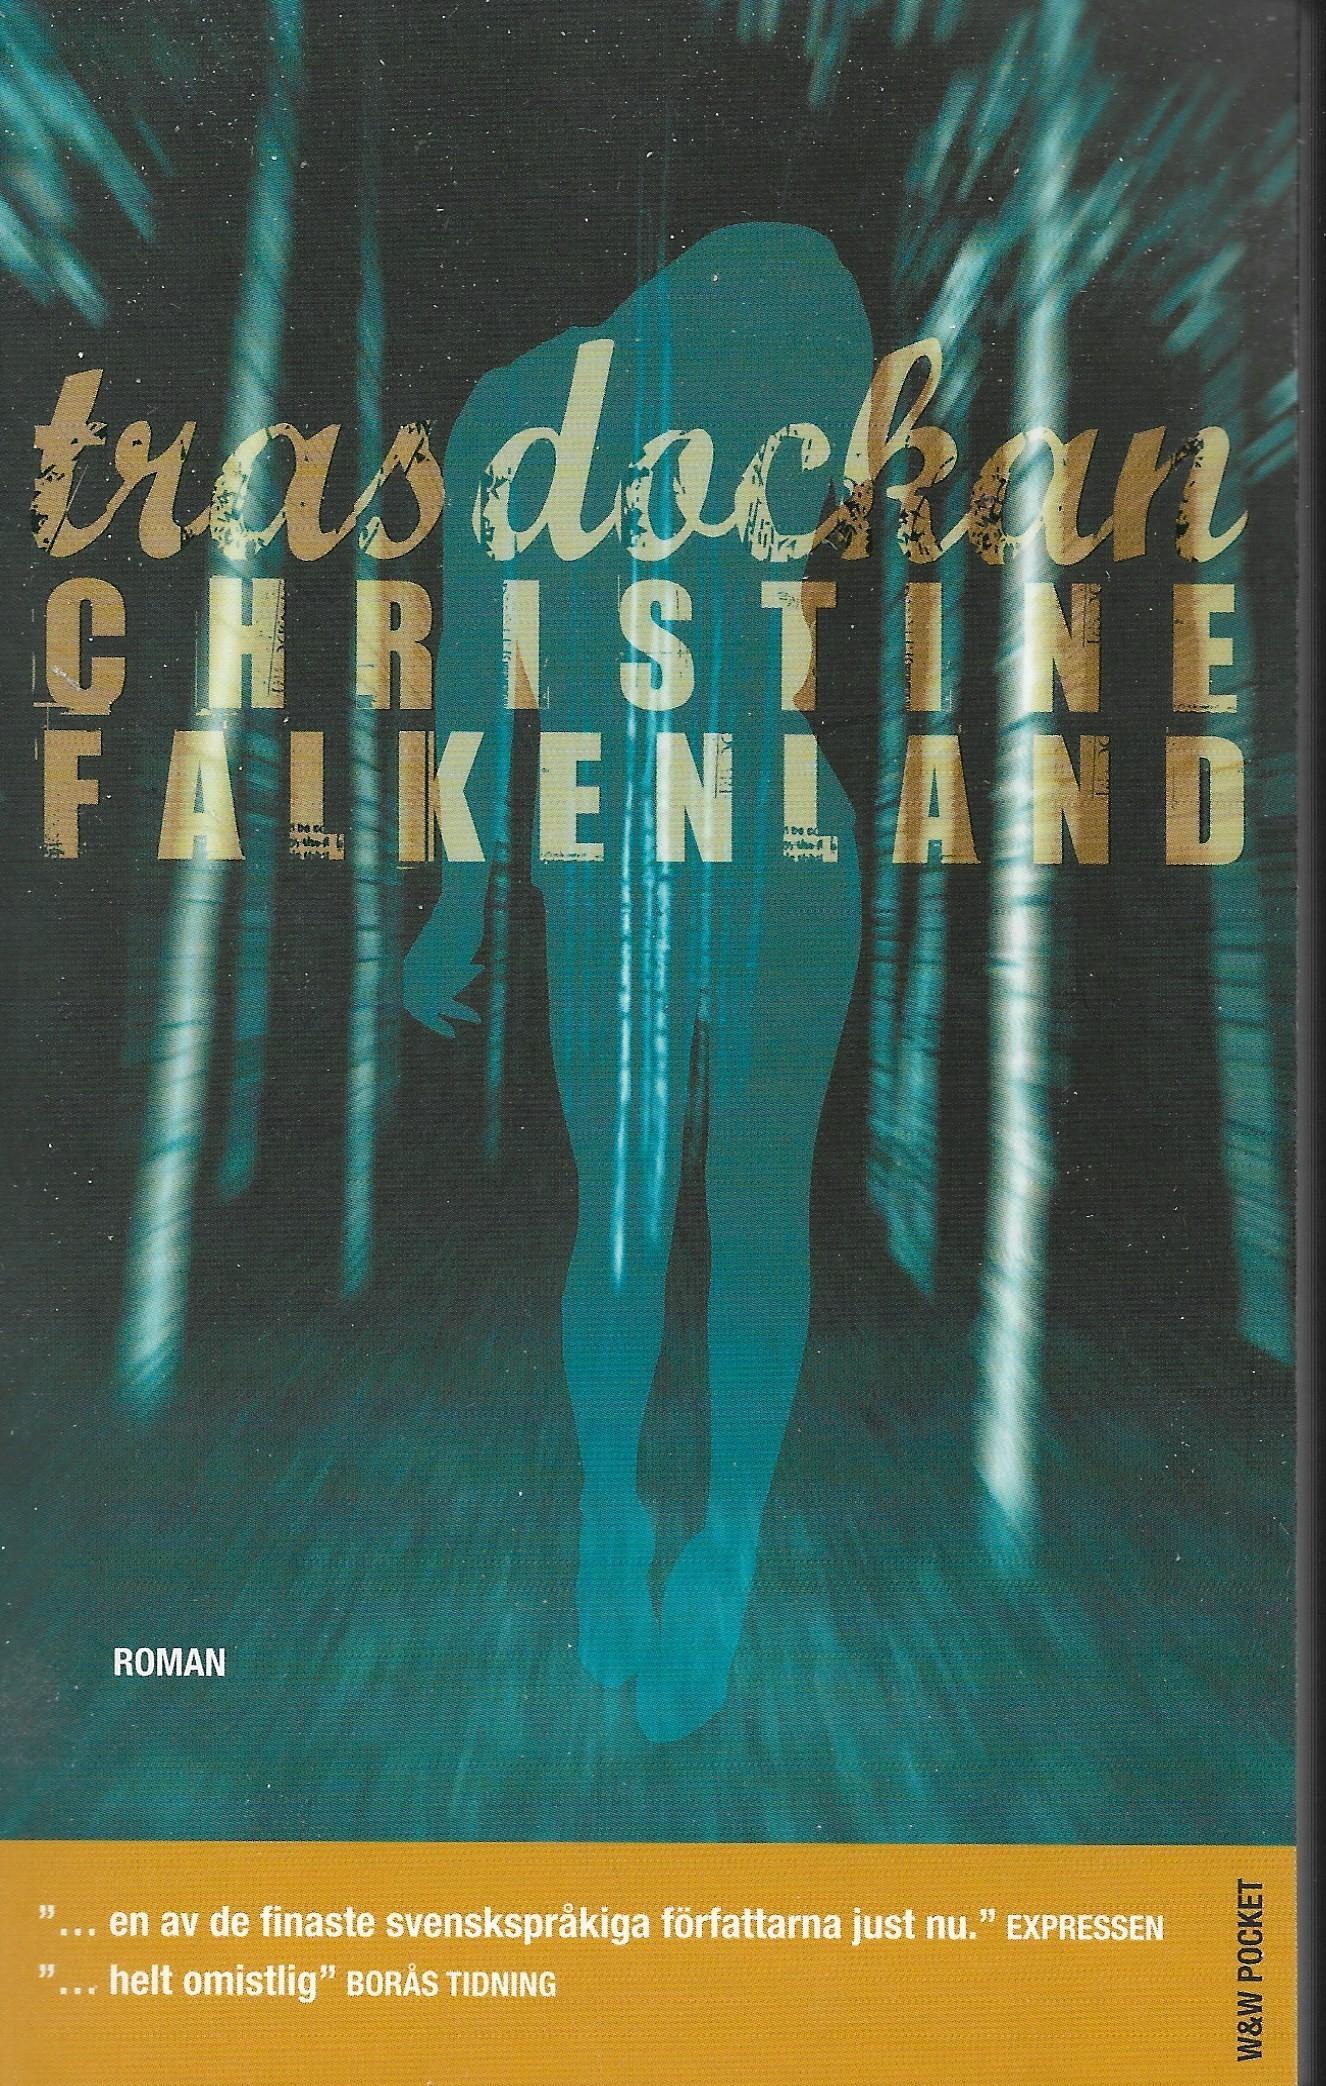 Trasdockan Christine Falkenland